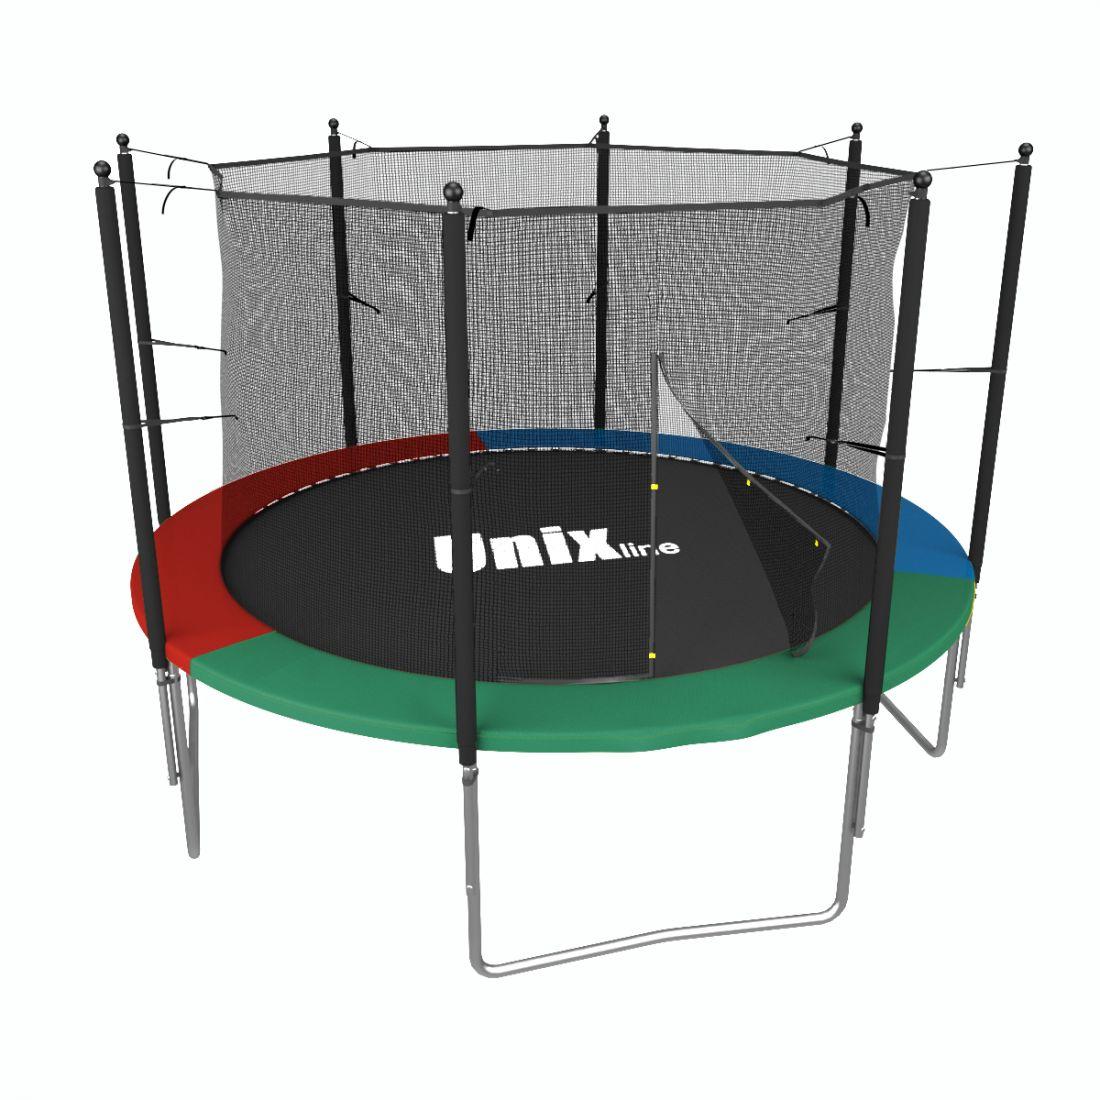 Батут Unix line Simple 8 ft Color/Green (inside)